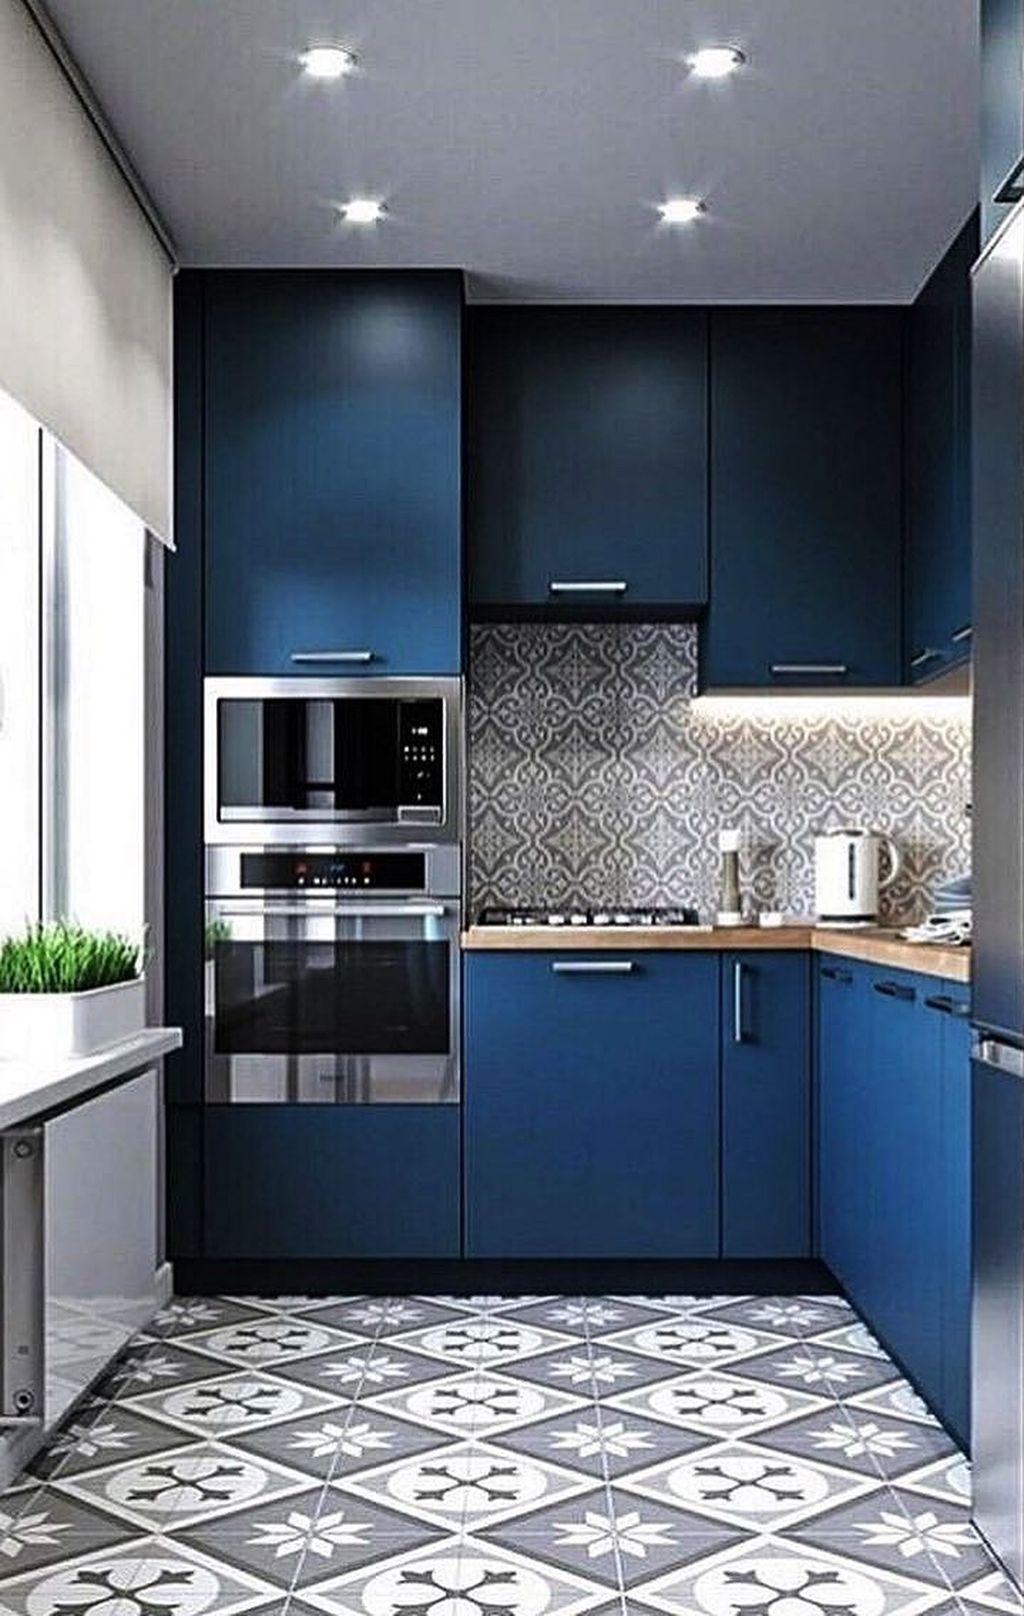 20 Gorgeous Small Kitchen Design Ideas For Your Small Home Kitchen Room Design Kitchen Remodel Small Modern Kitchen Design